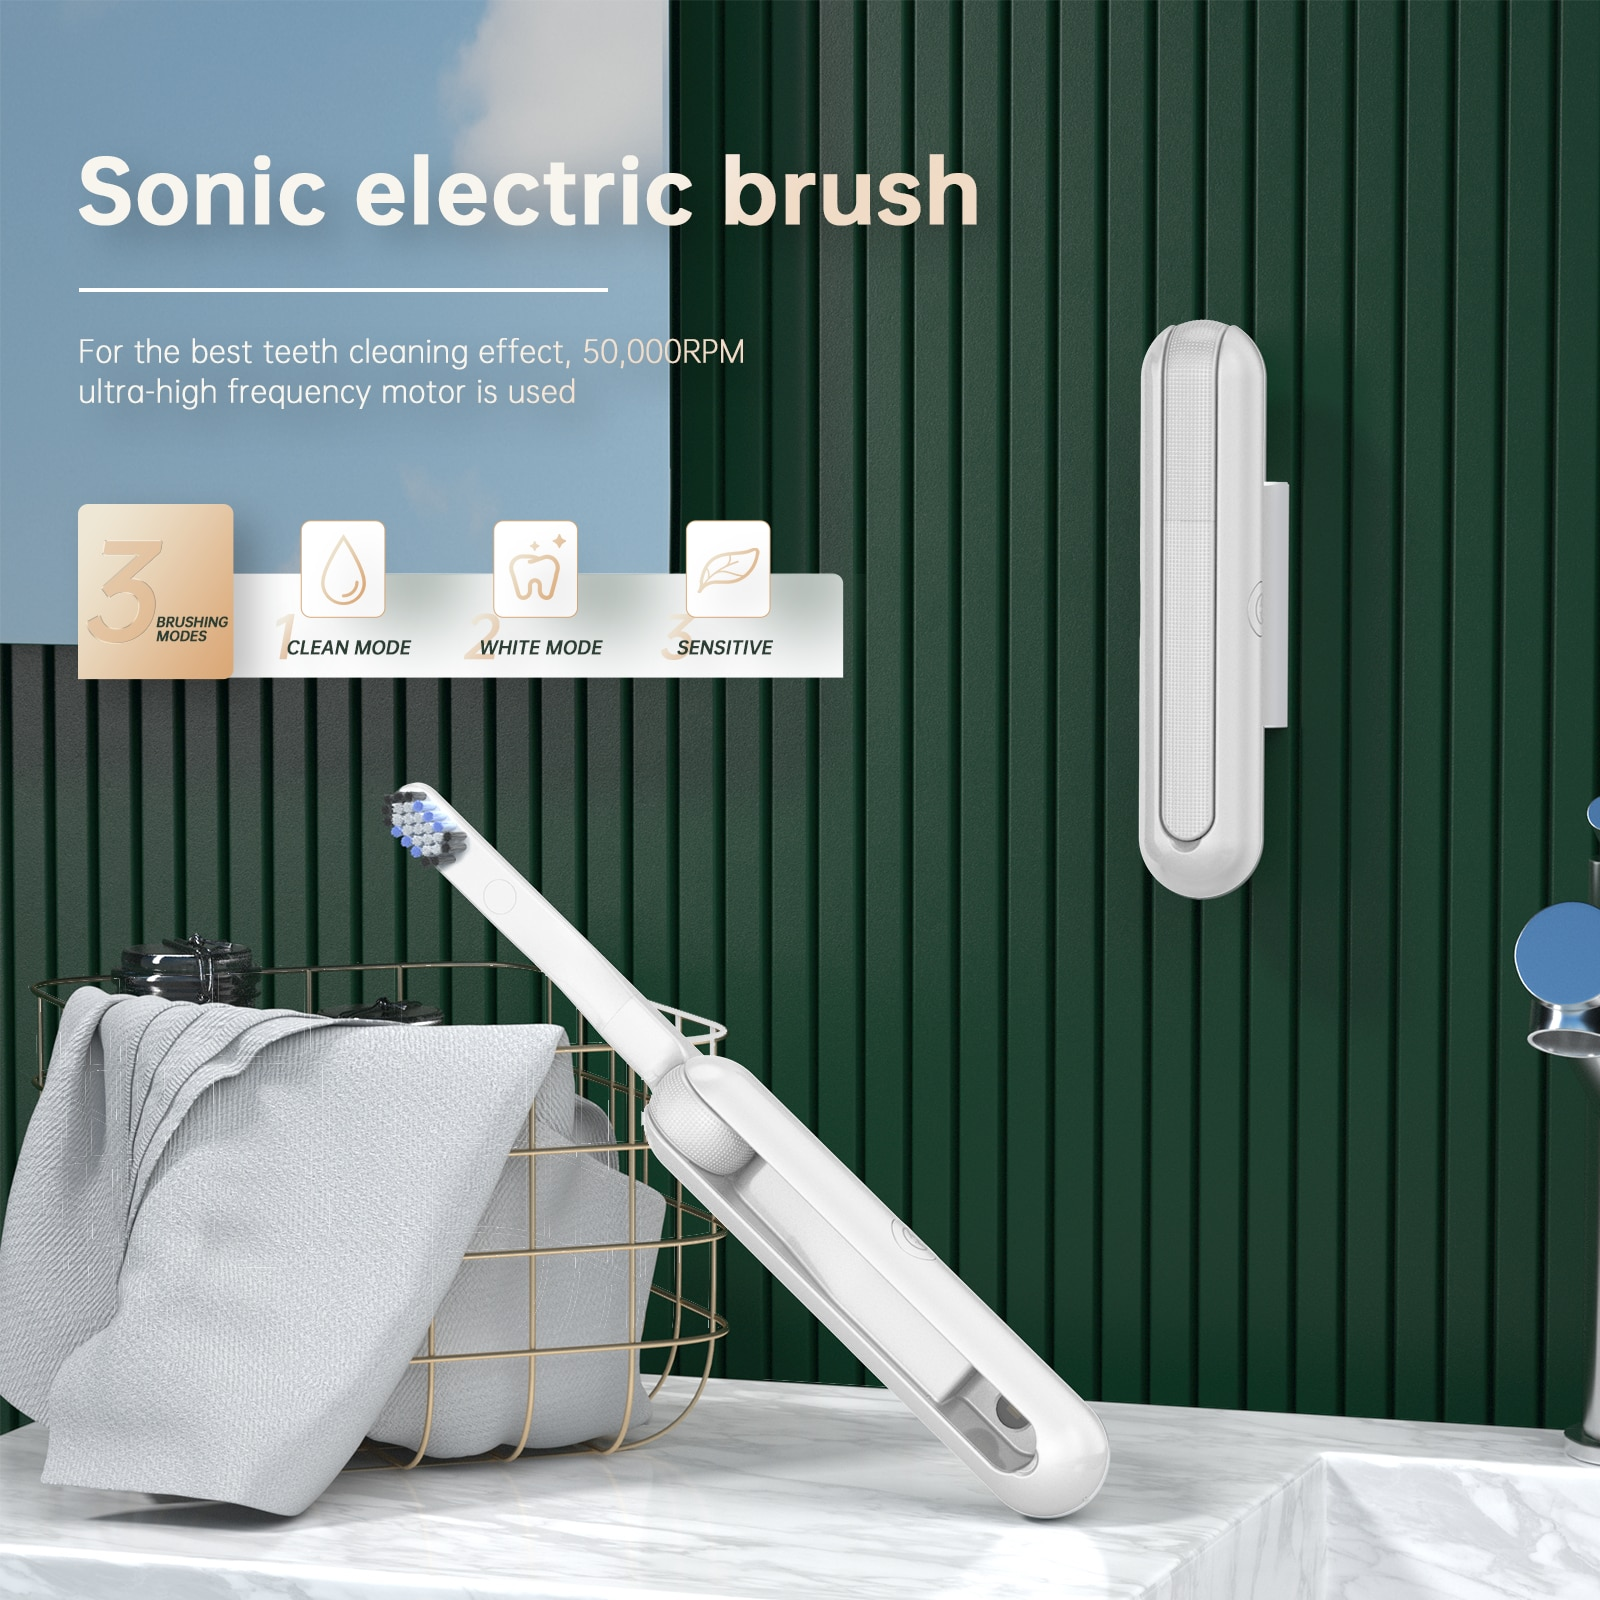 UTC600 Ultrasonic Electric Toothbrush Portable Wireless Charging UV sterilization Disinfection Electric Folding Toothbrush enlarge